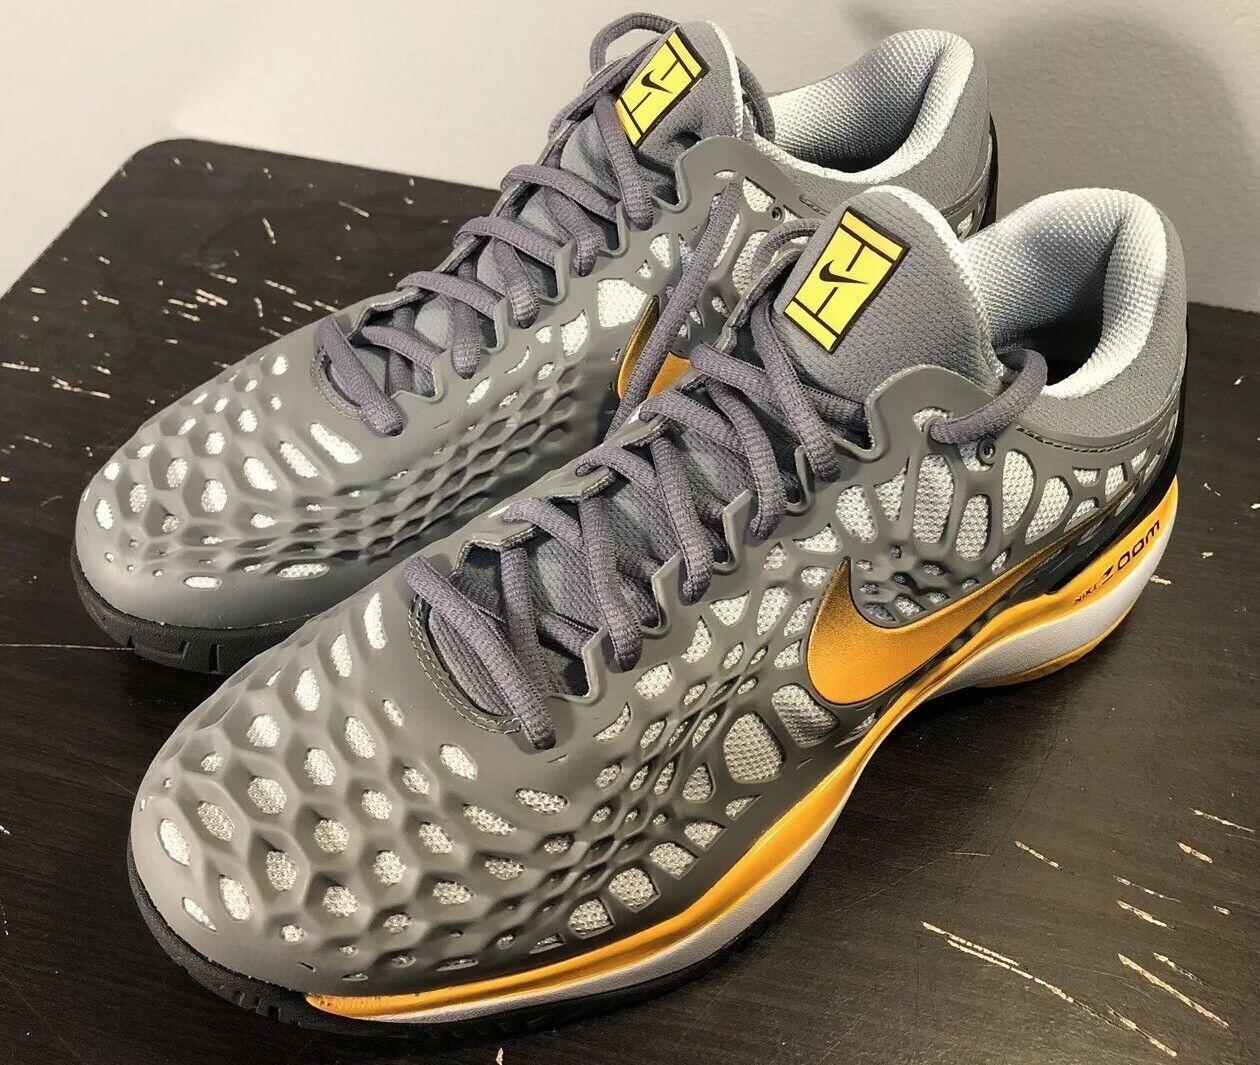 10 Men's Nike Air Zoom Cage 3 HC 918193 003 White Black yellow grey Tennis sport